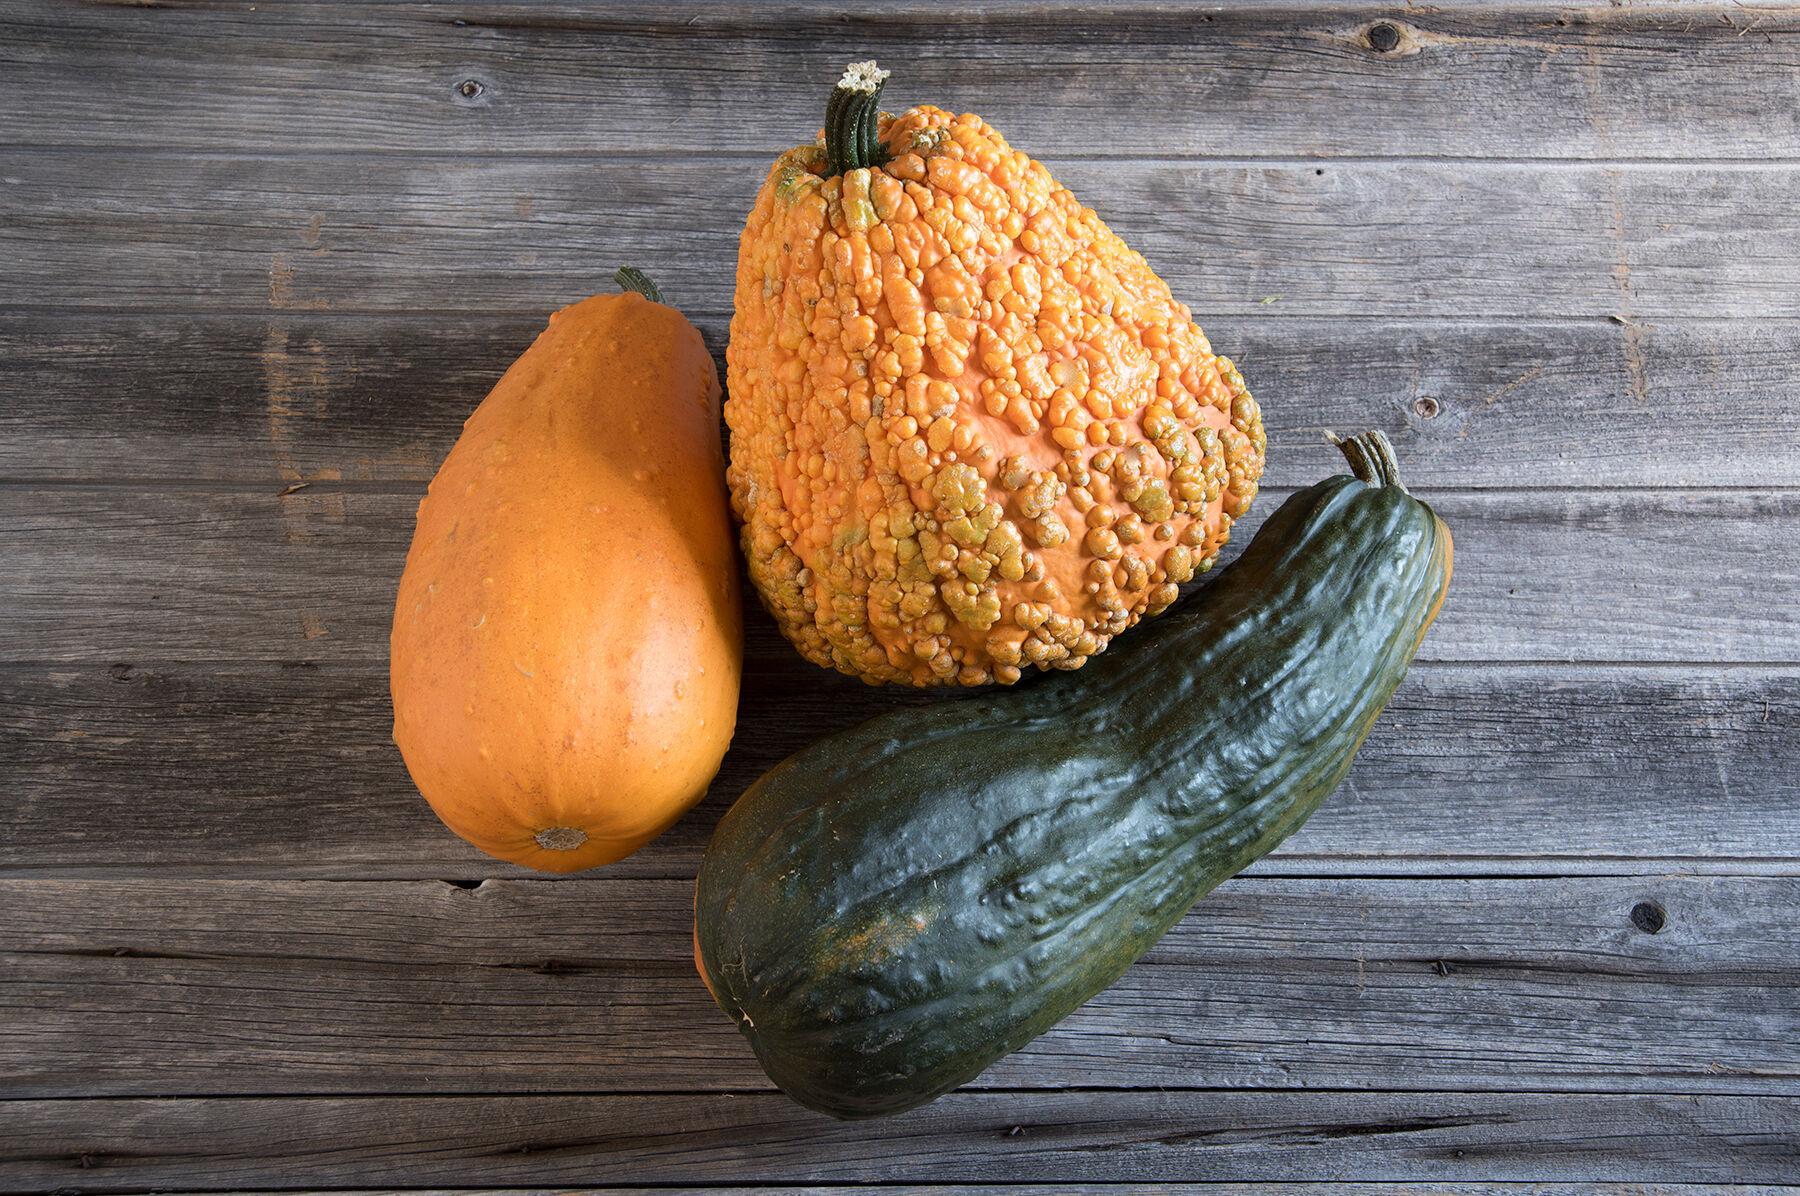 Gourds die before mature